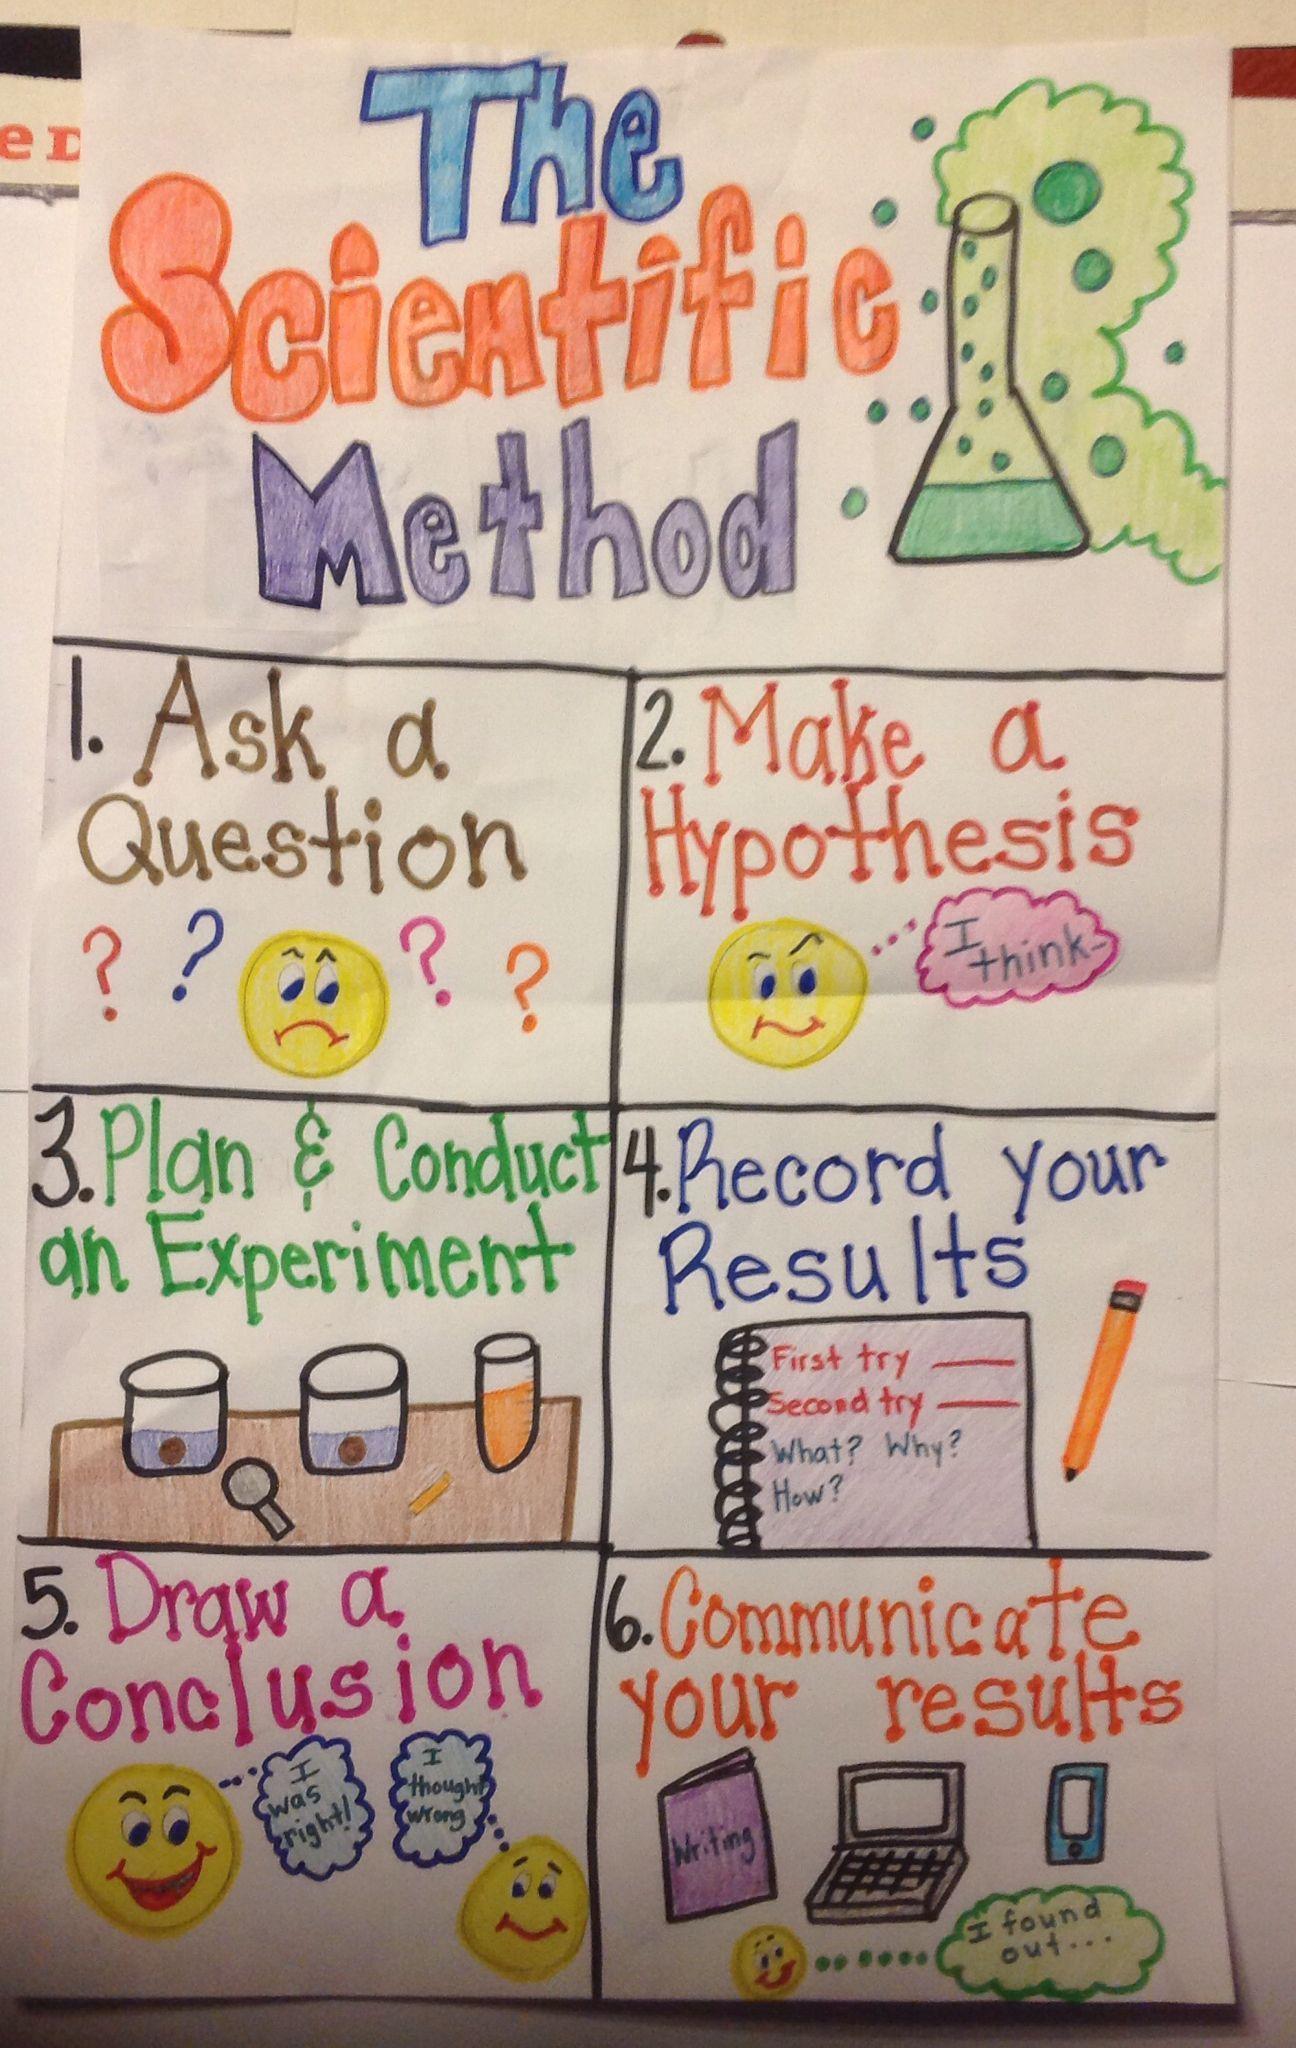 Scientific Method Anchor Chat In 2020 Scientific Method Scientific Method Anchor Chart Middle School Science Experiments [ 2048 x 1296 Pixel ]